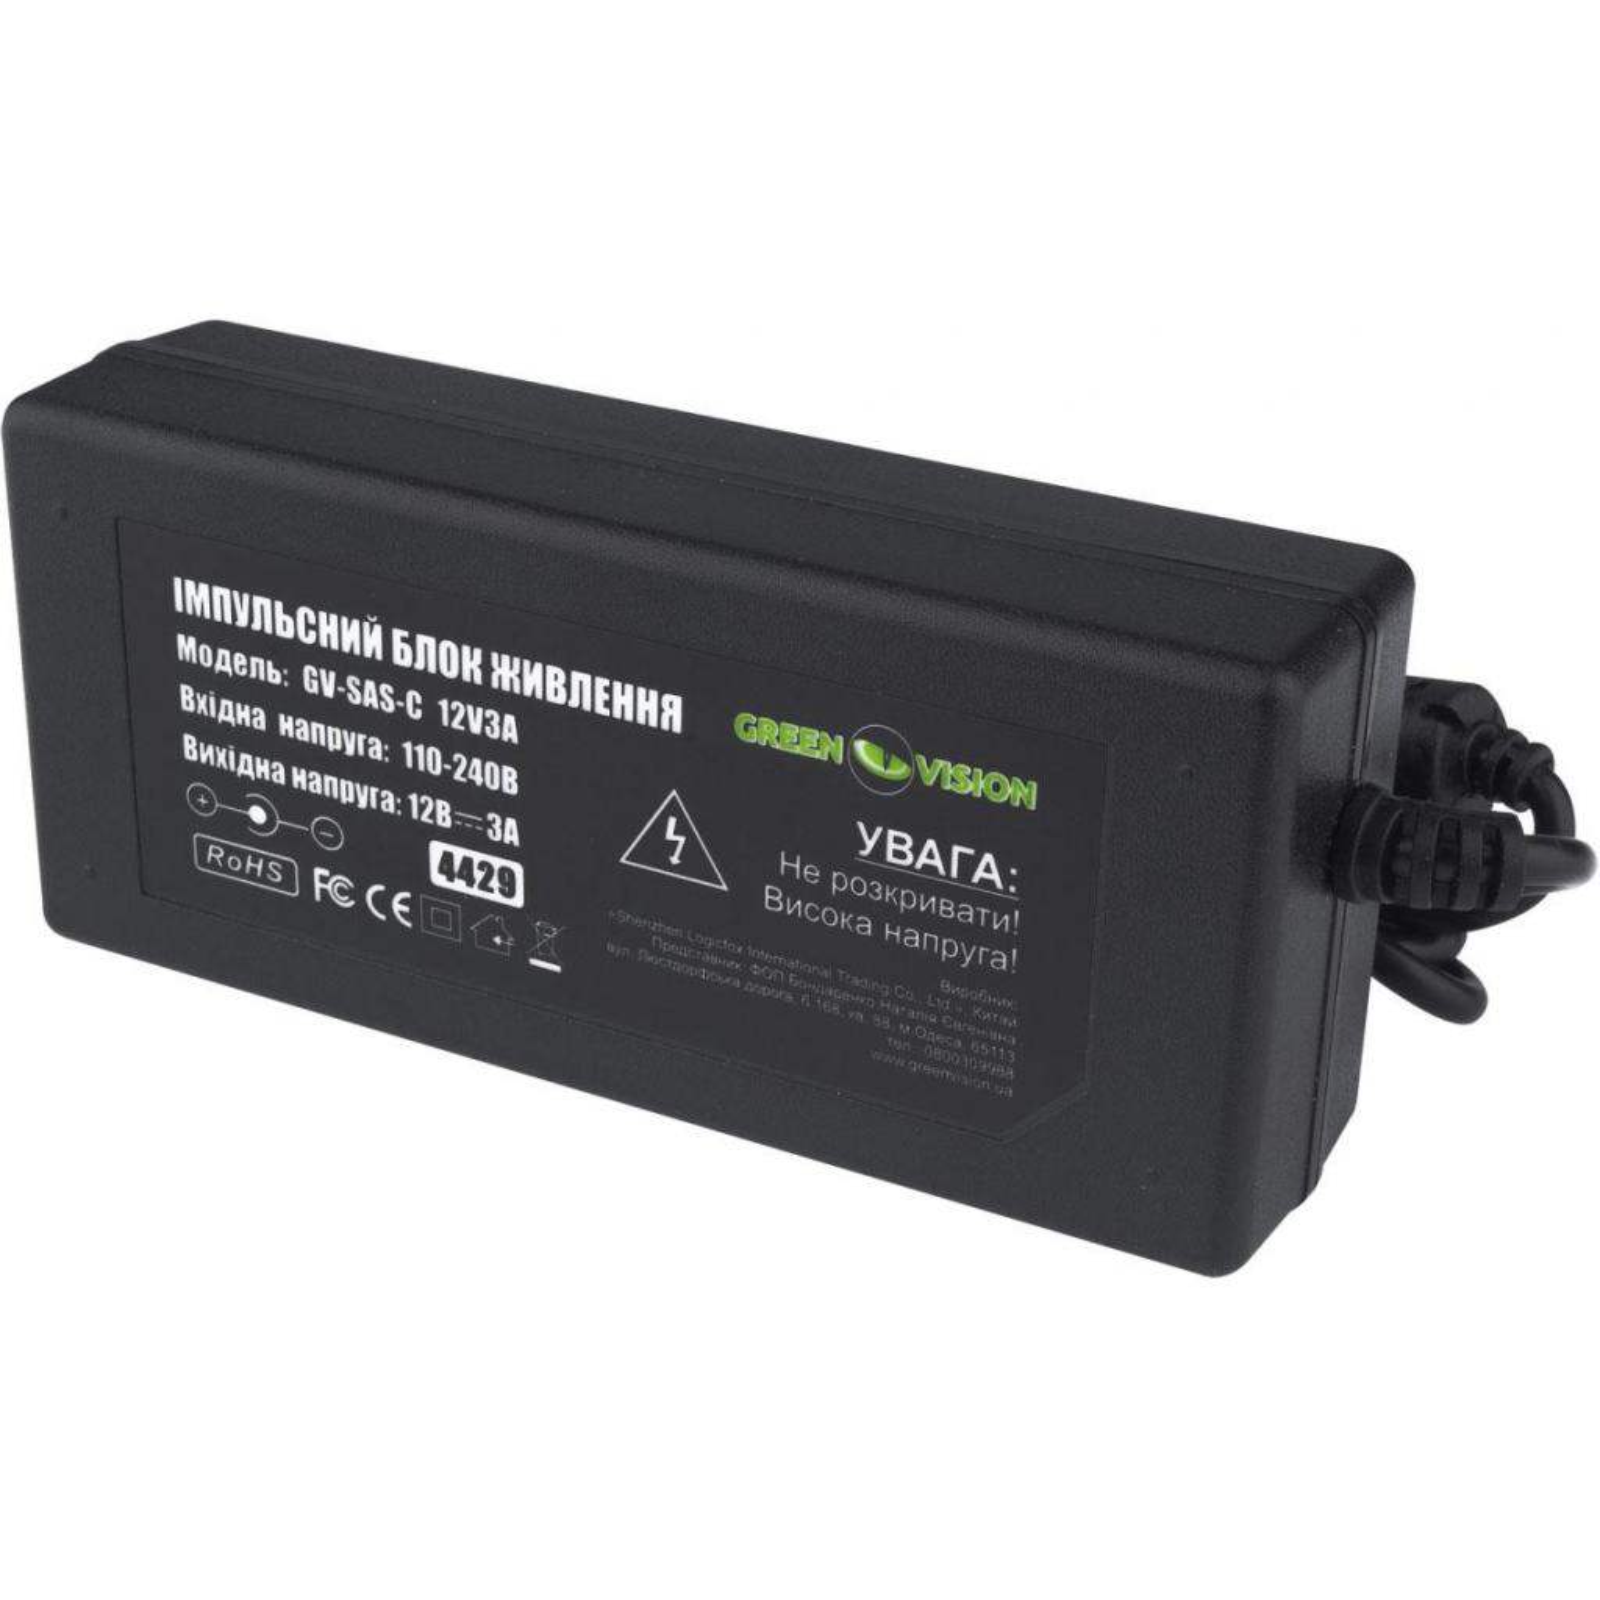 Блок питания GreenVision GV-SAS-C 12V3A (4429)